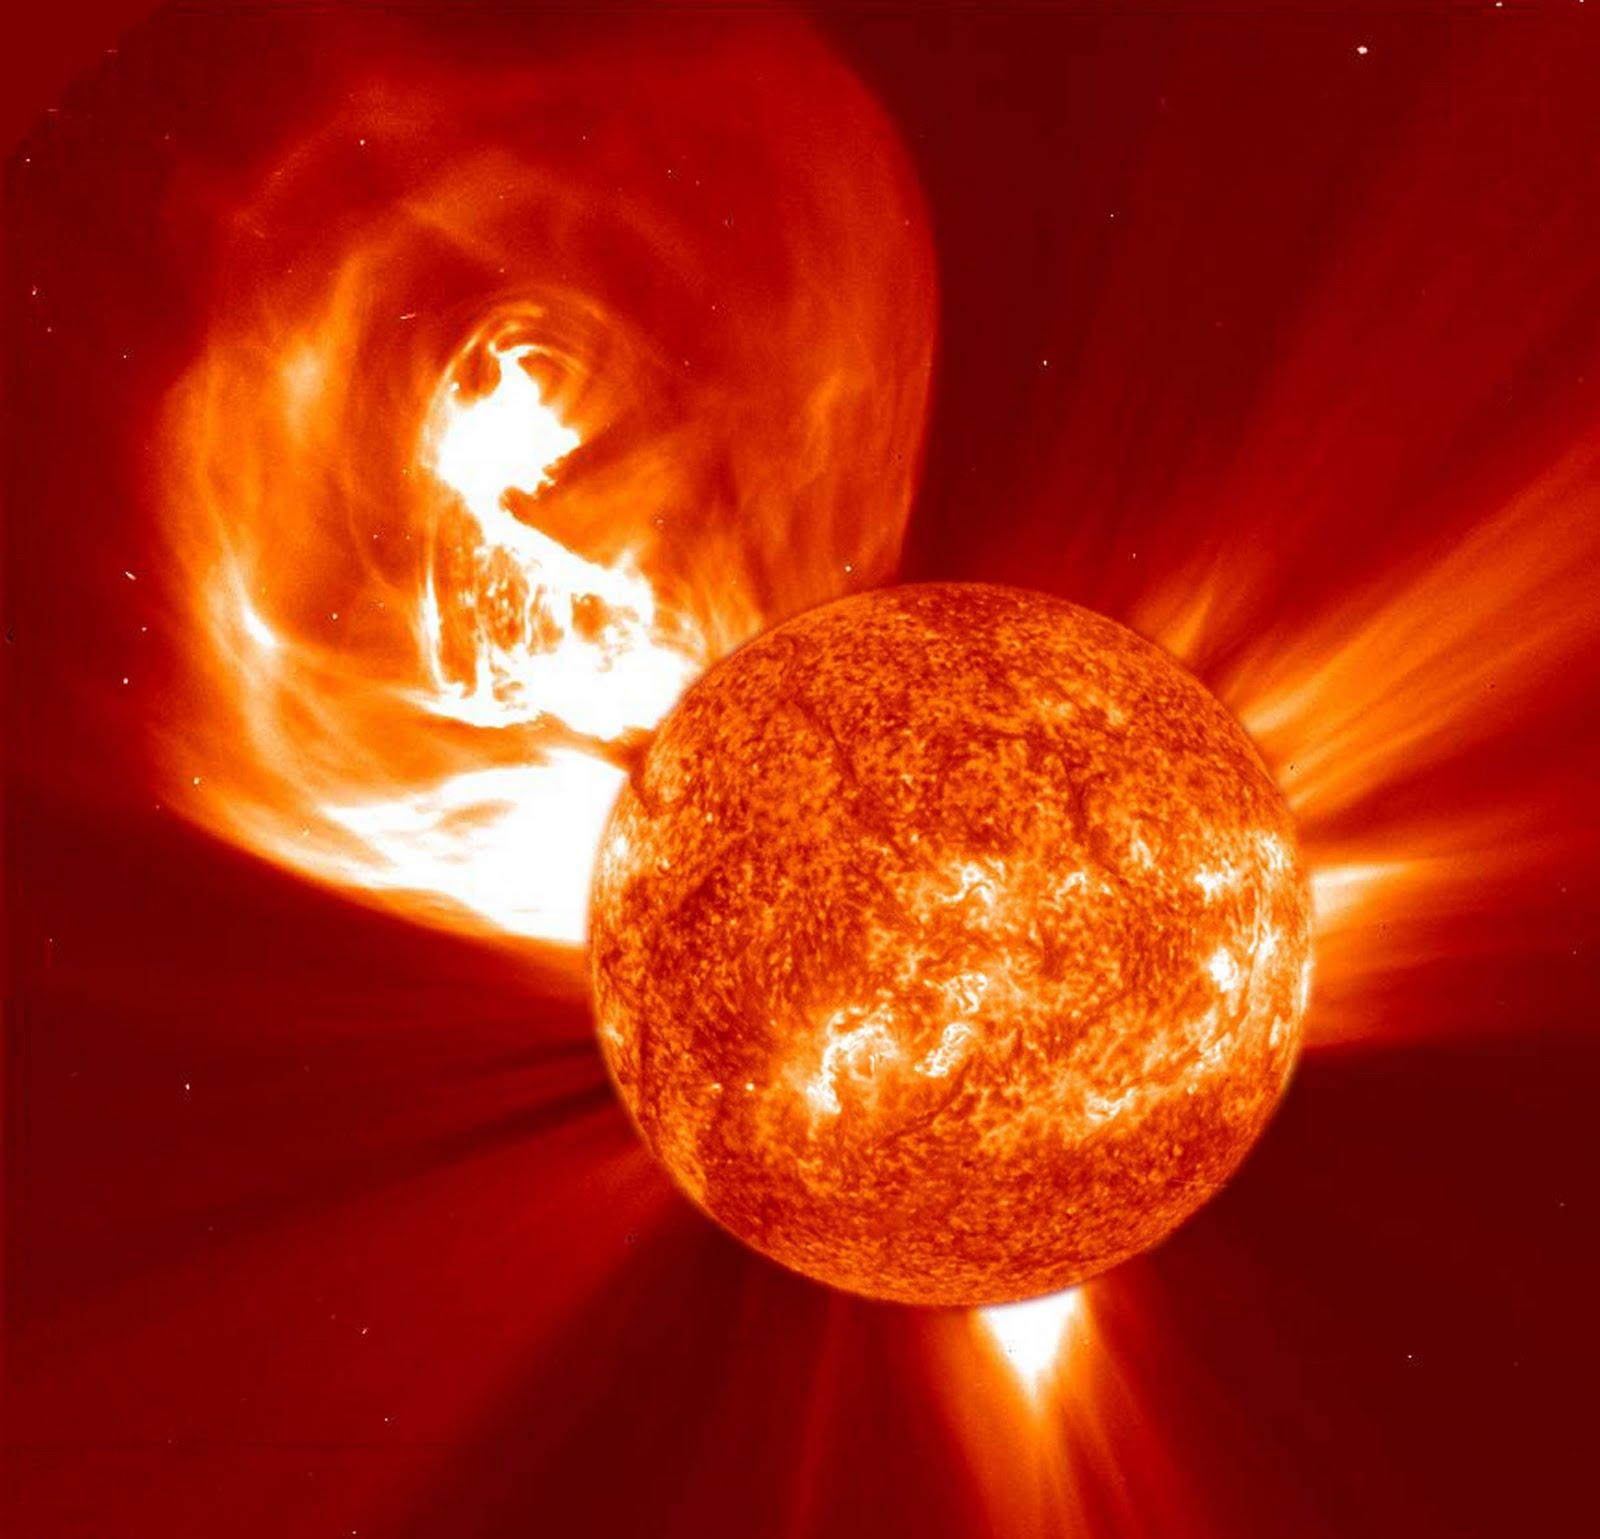 NASA UPGRADES 2012 SOLAR STORM WARNING   THE REAL SIGNS OF THE TIMES